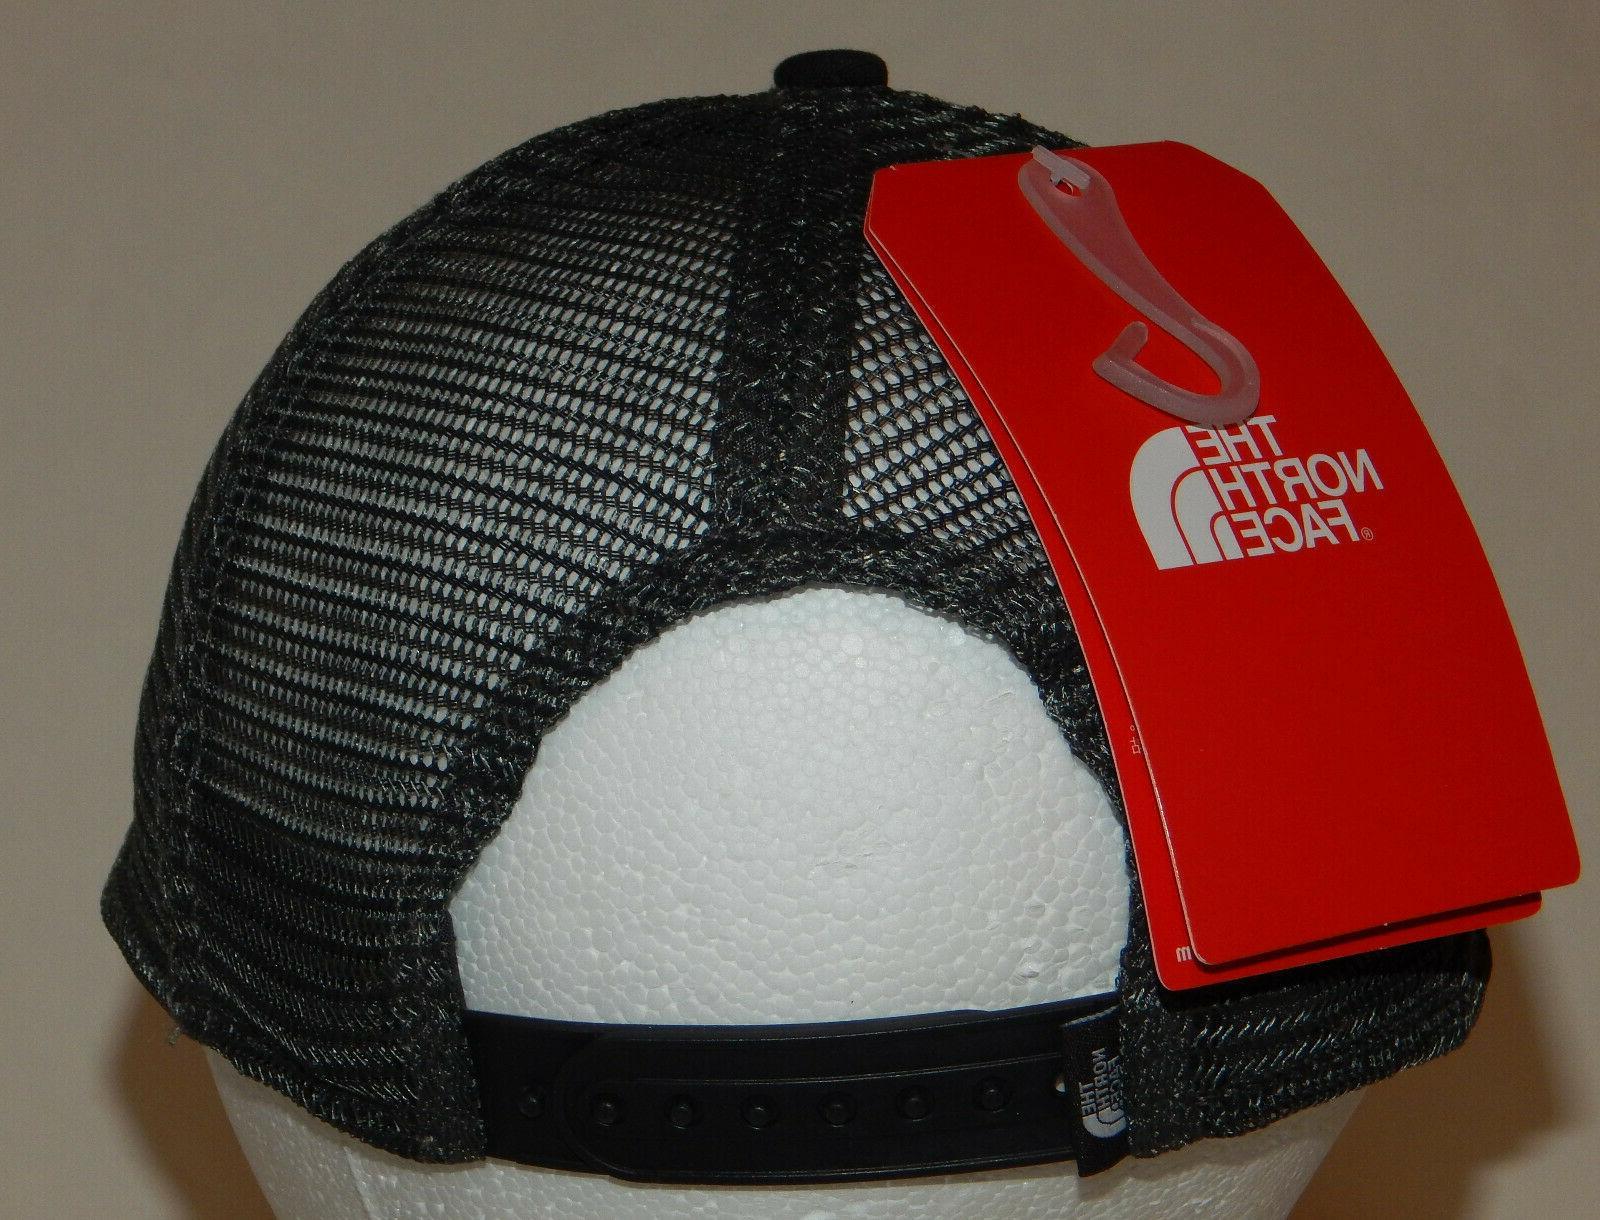 The North Face Hat / Cap Black / Snapback BAseball